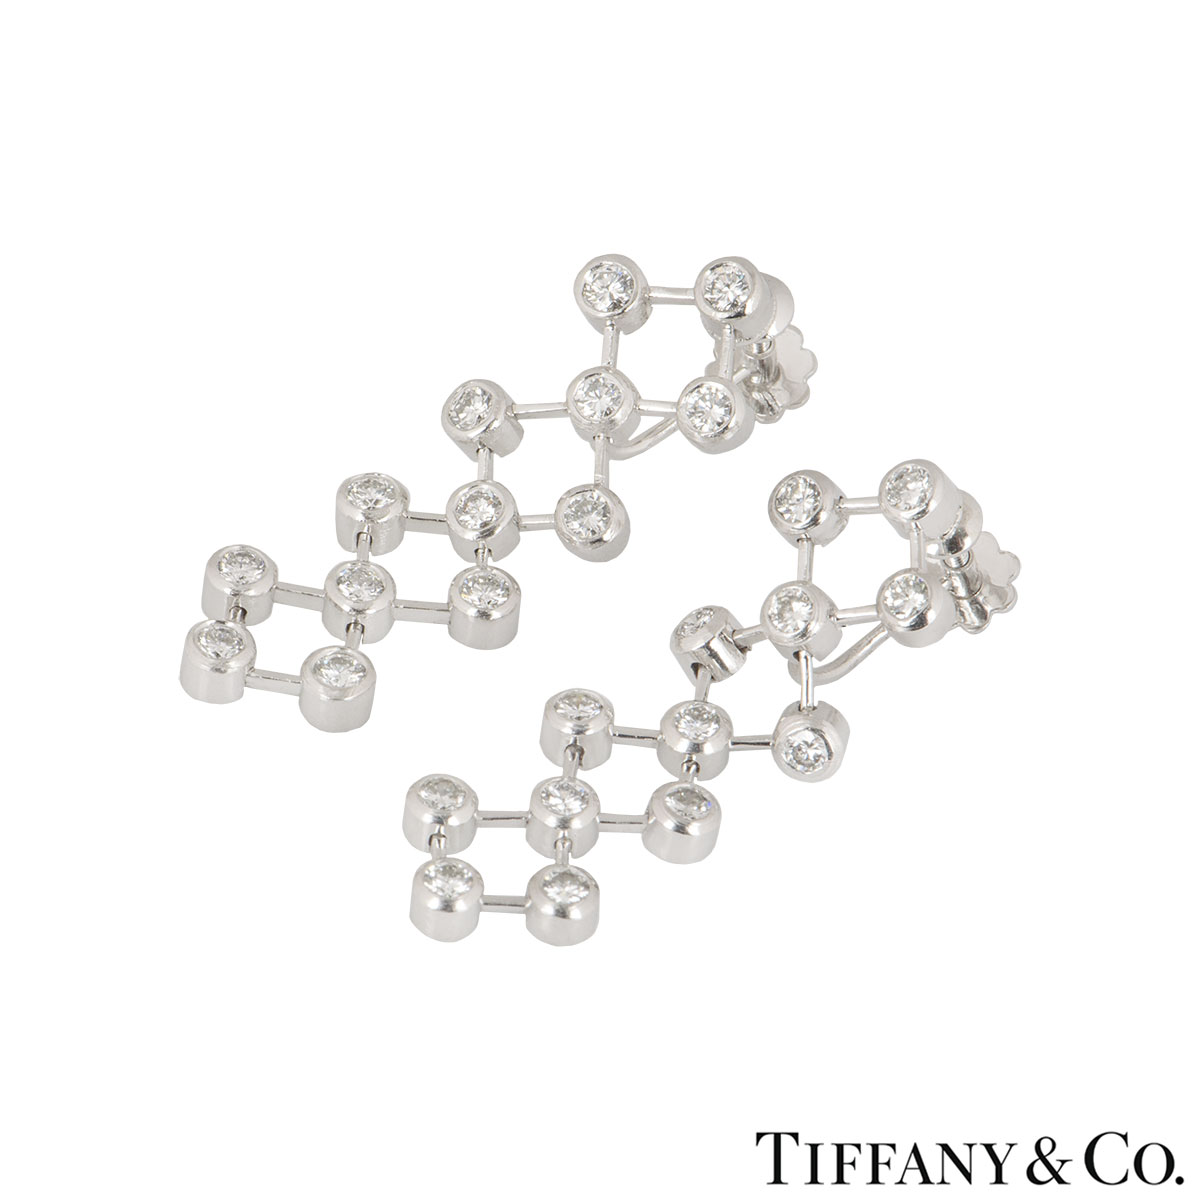 Tiffany & Co. Platinum Diamond Drop Earrings